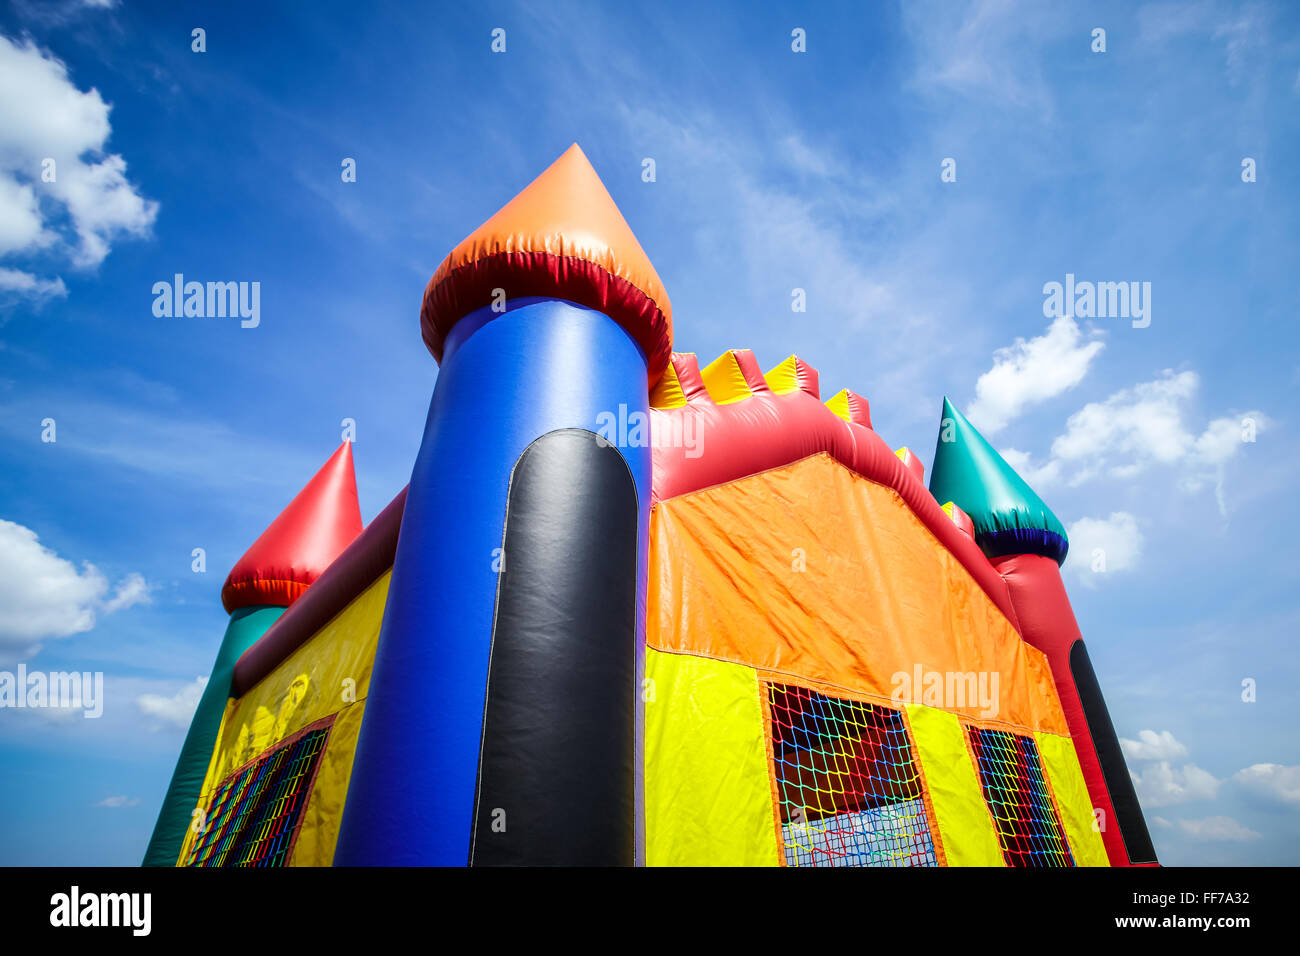 Kinder aufblasbare jumpy Haus Burg obere Hälfte. Stockbild